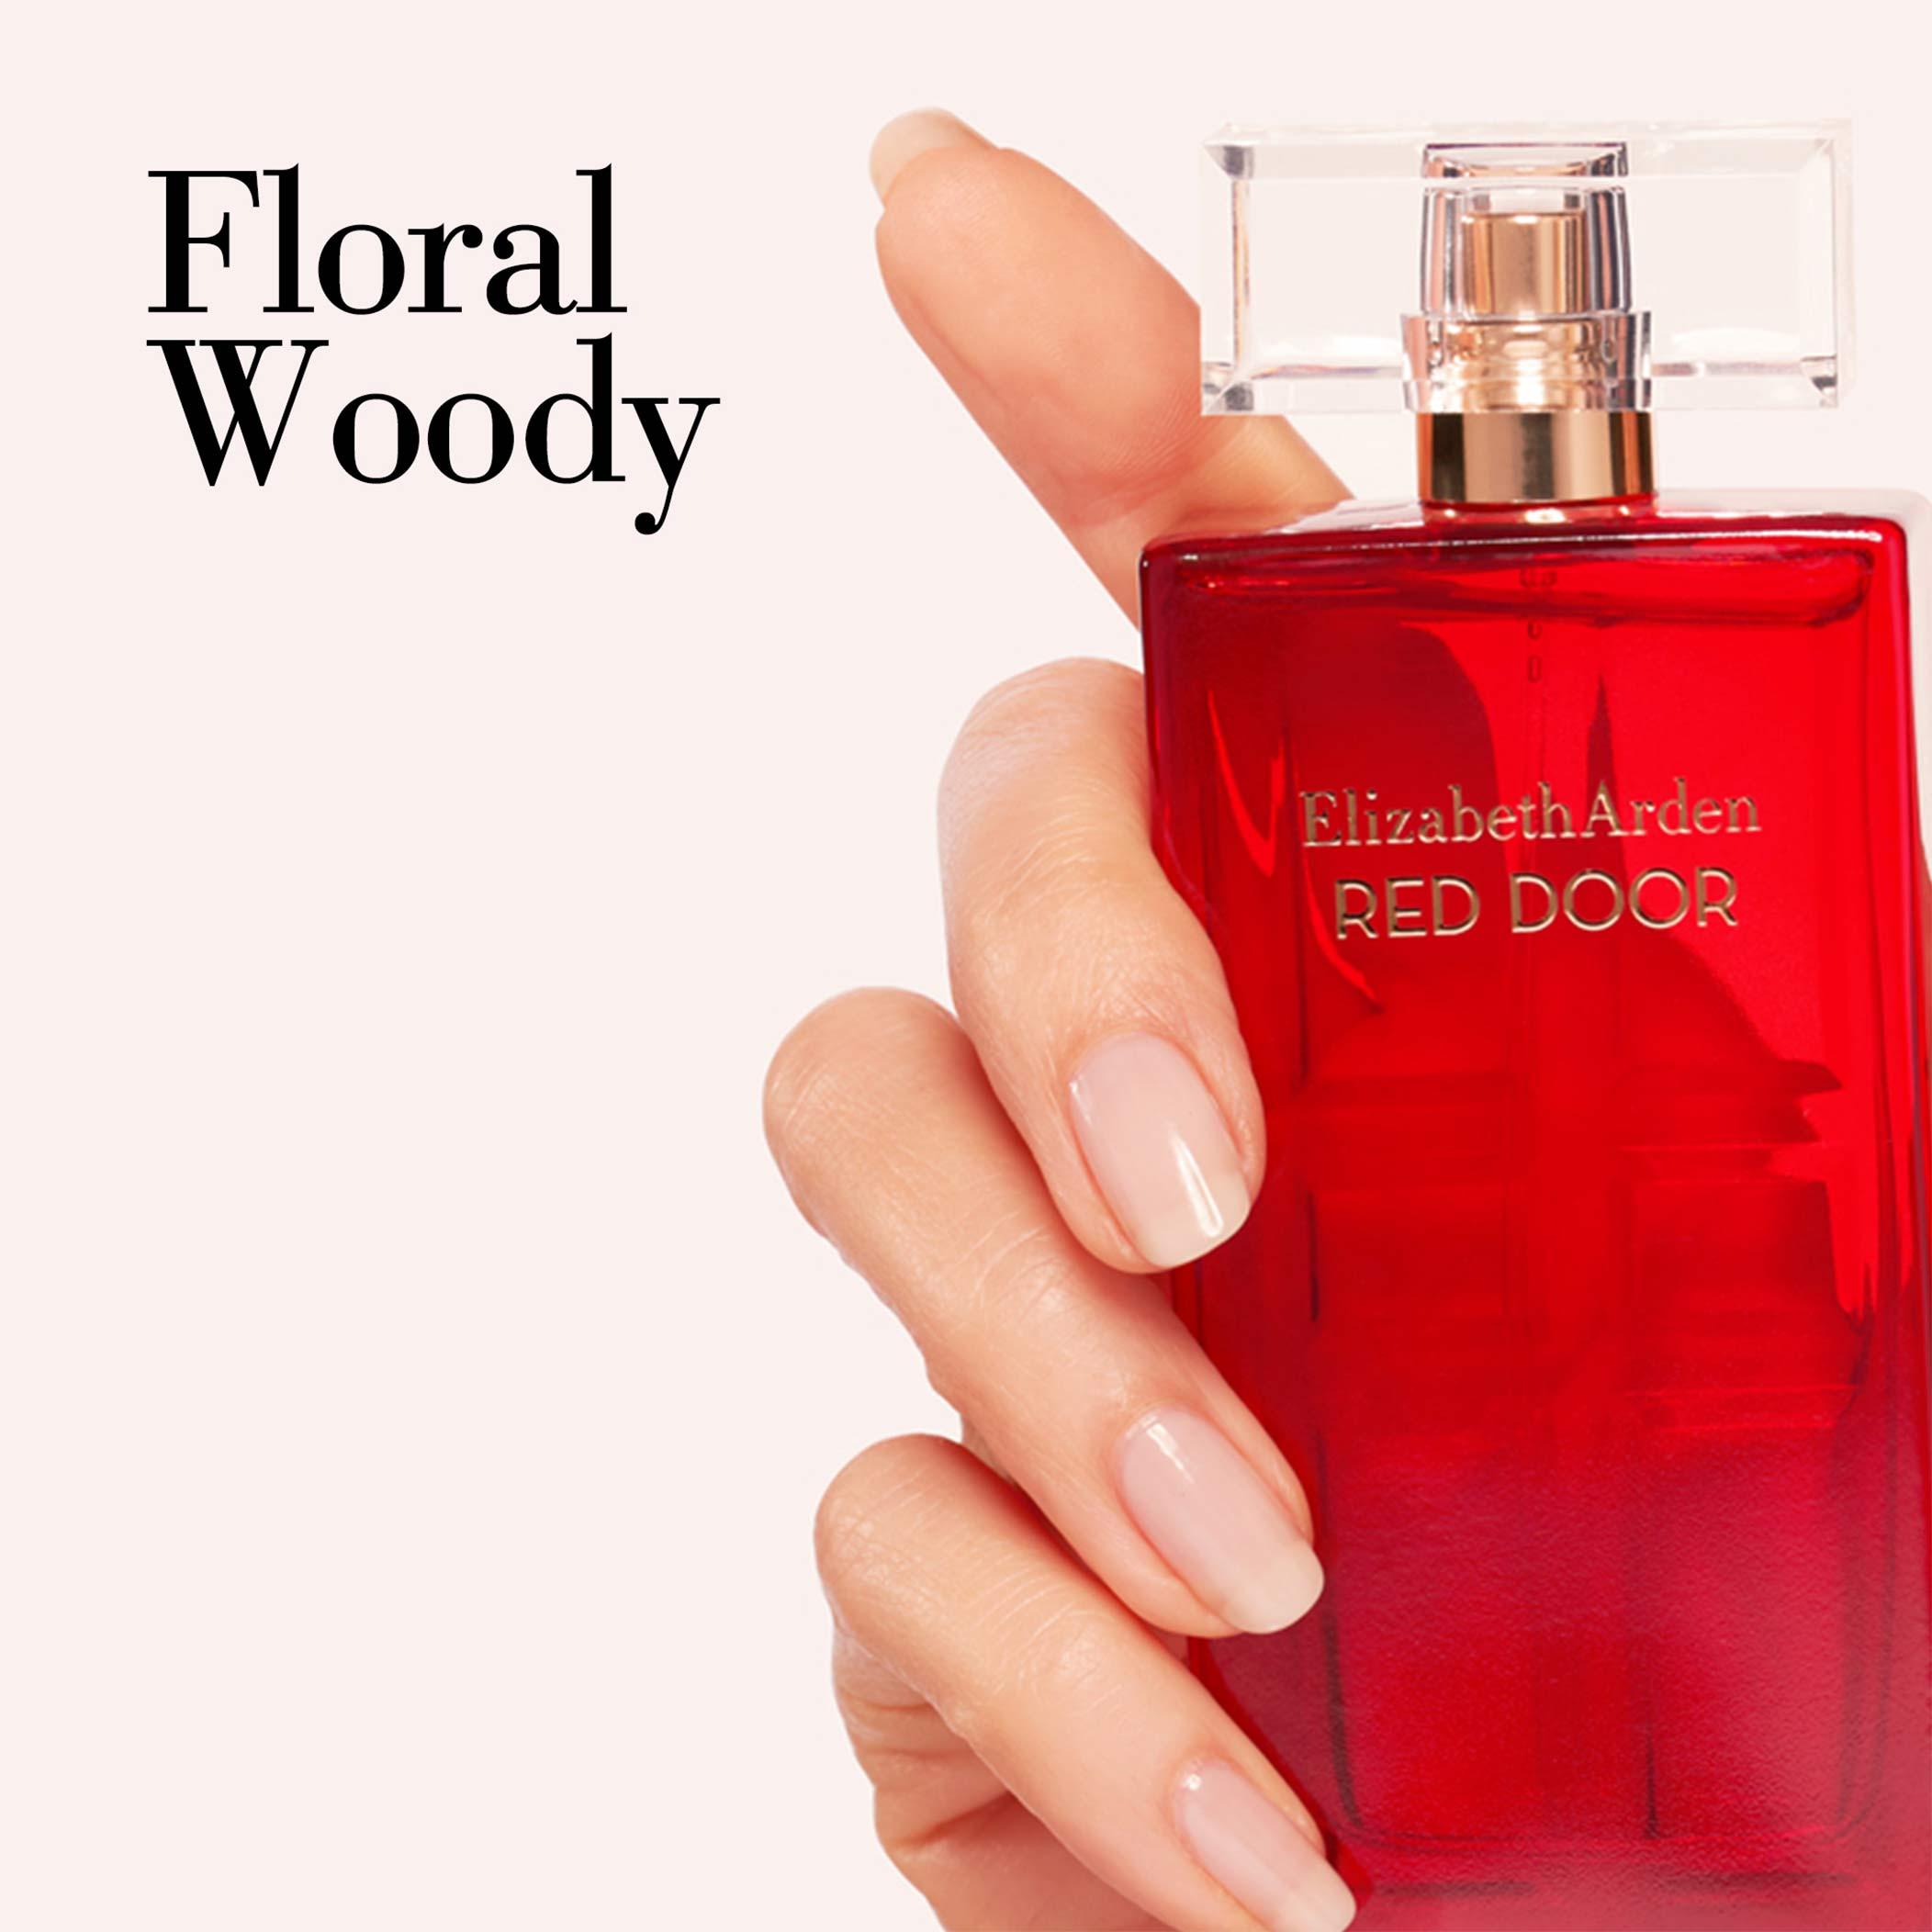 Floral Woody